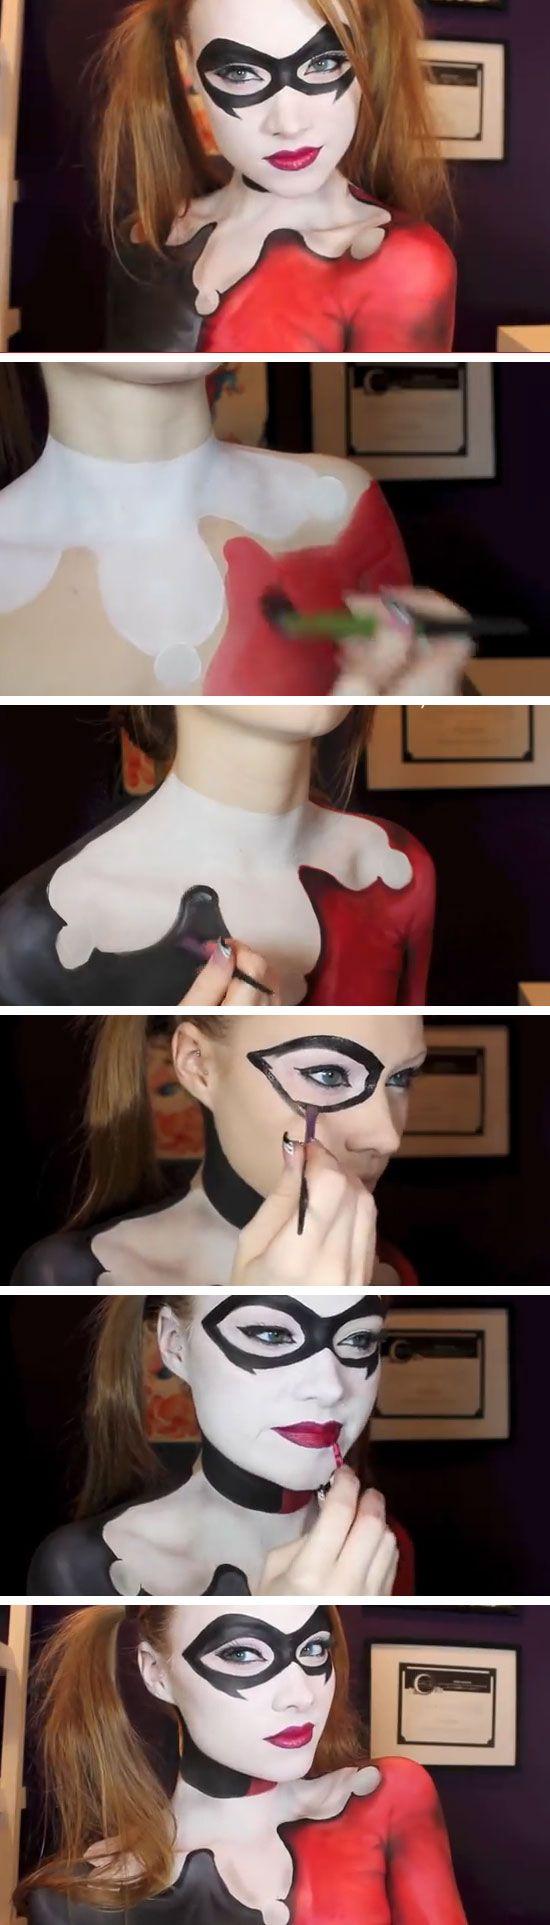 harley costume